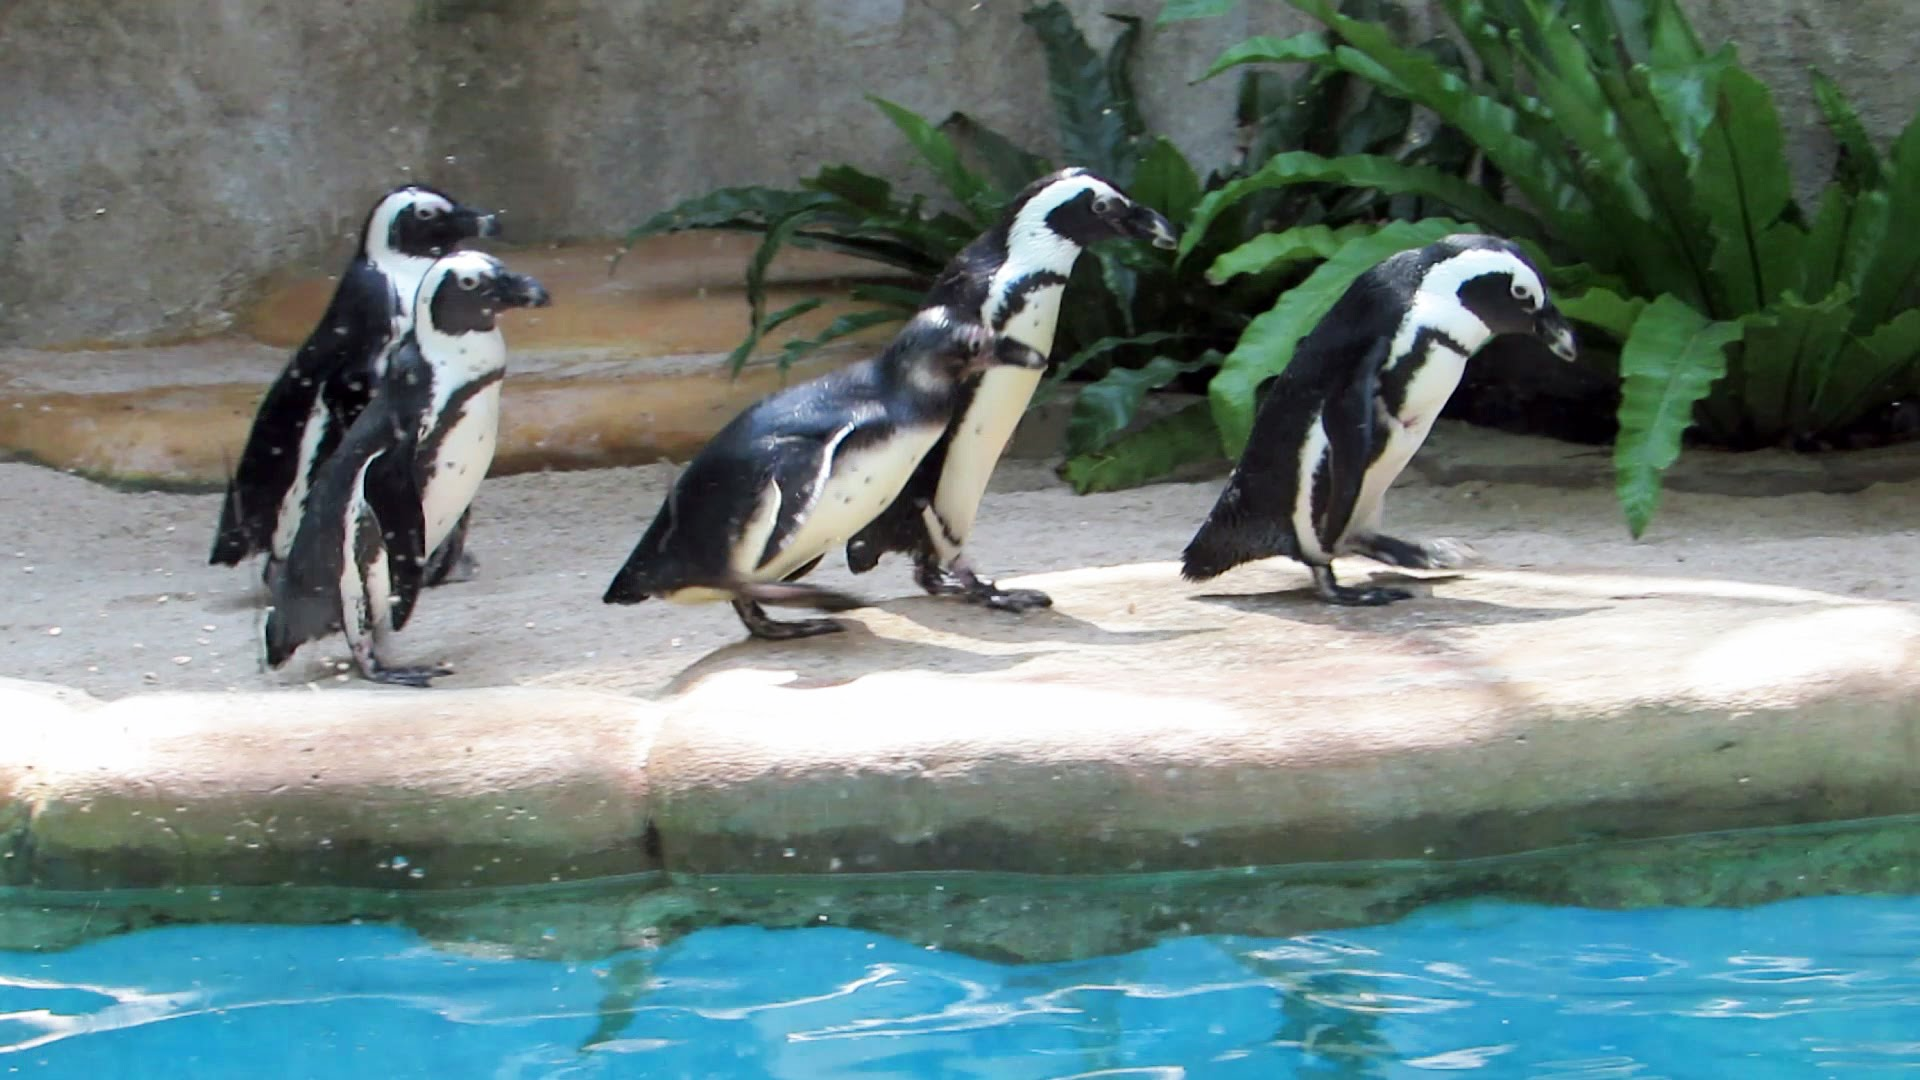 Pinguin Kebun Binatang Gembira Loka Jogja Indonesia Youtube Bonbin Yogyakarta